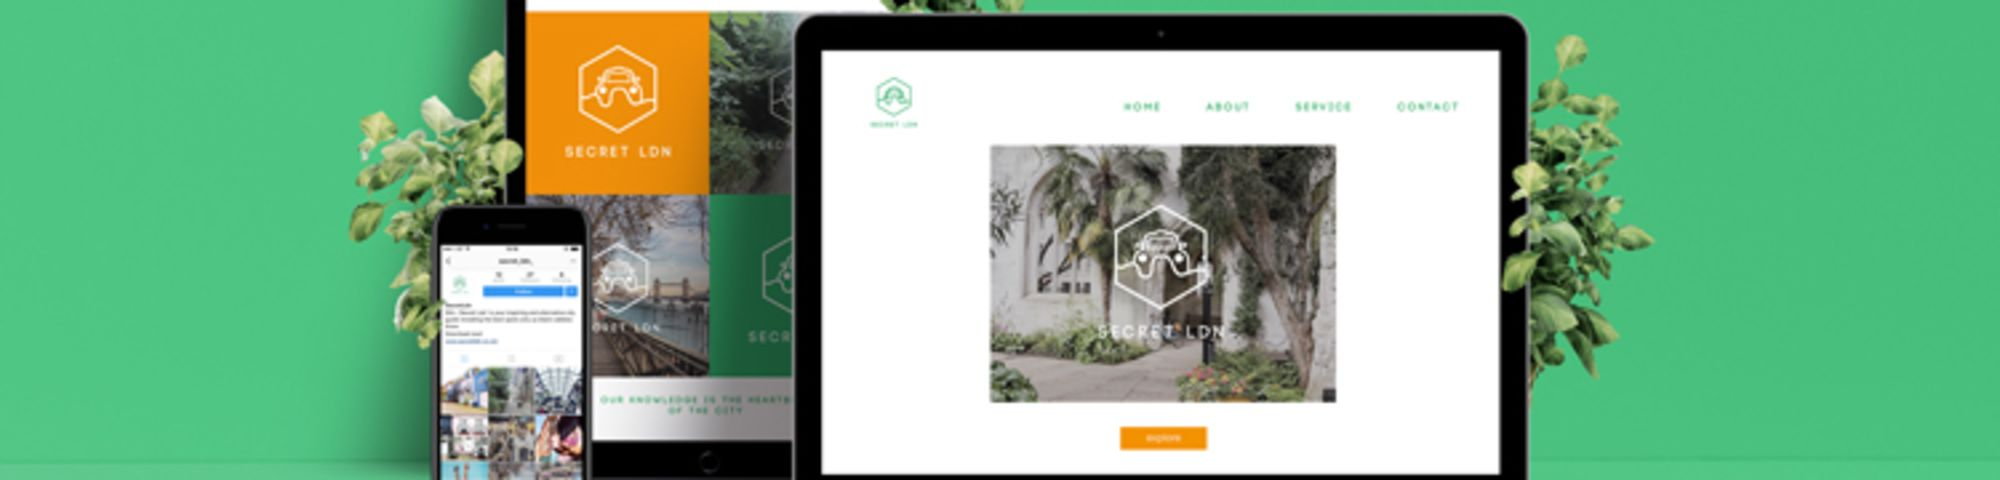 Web-Showcase-Project-Presentation-full